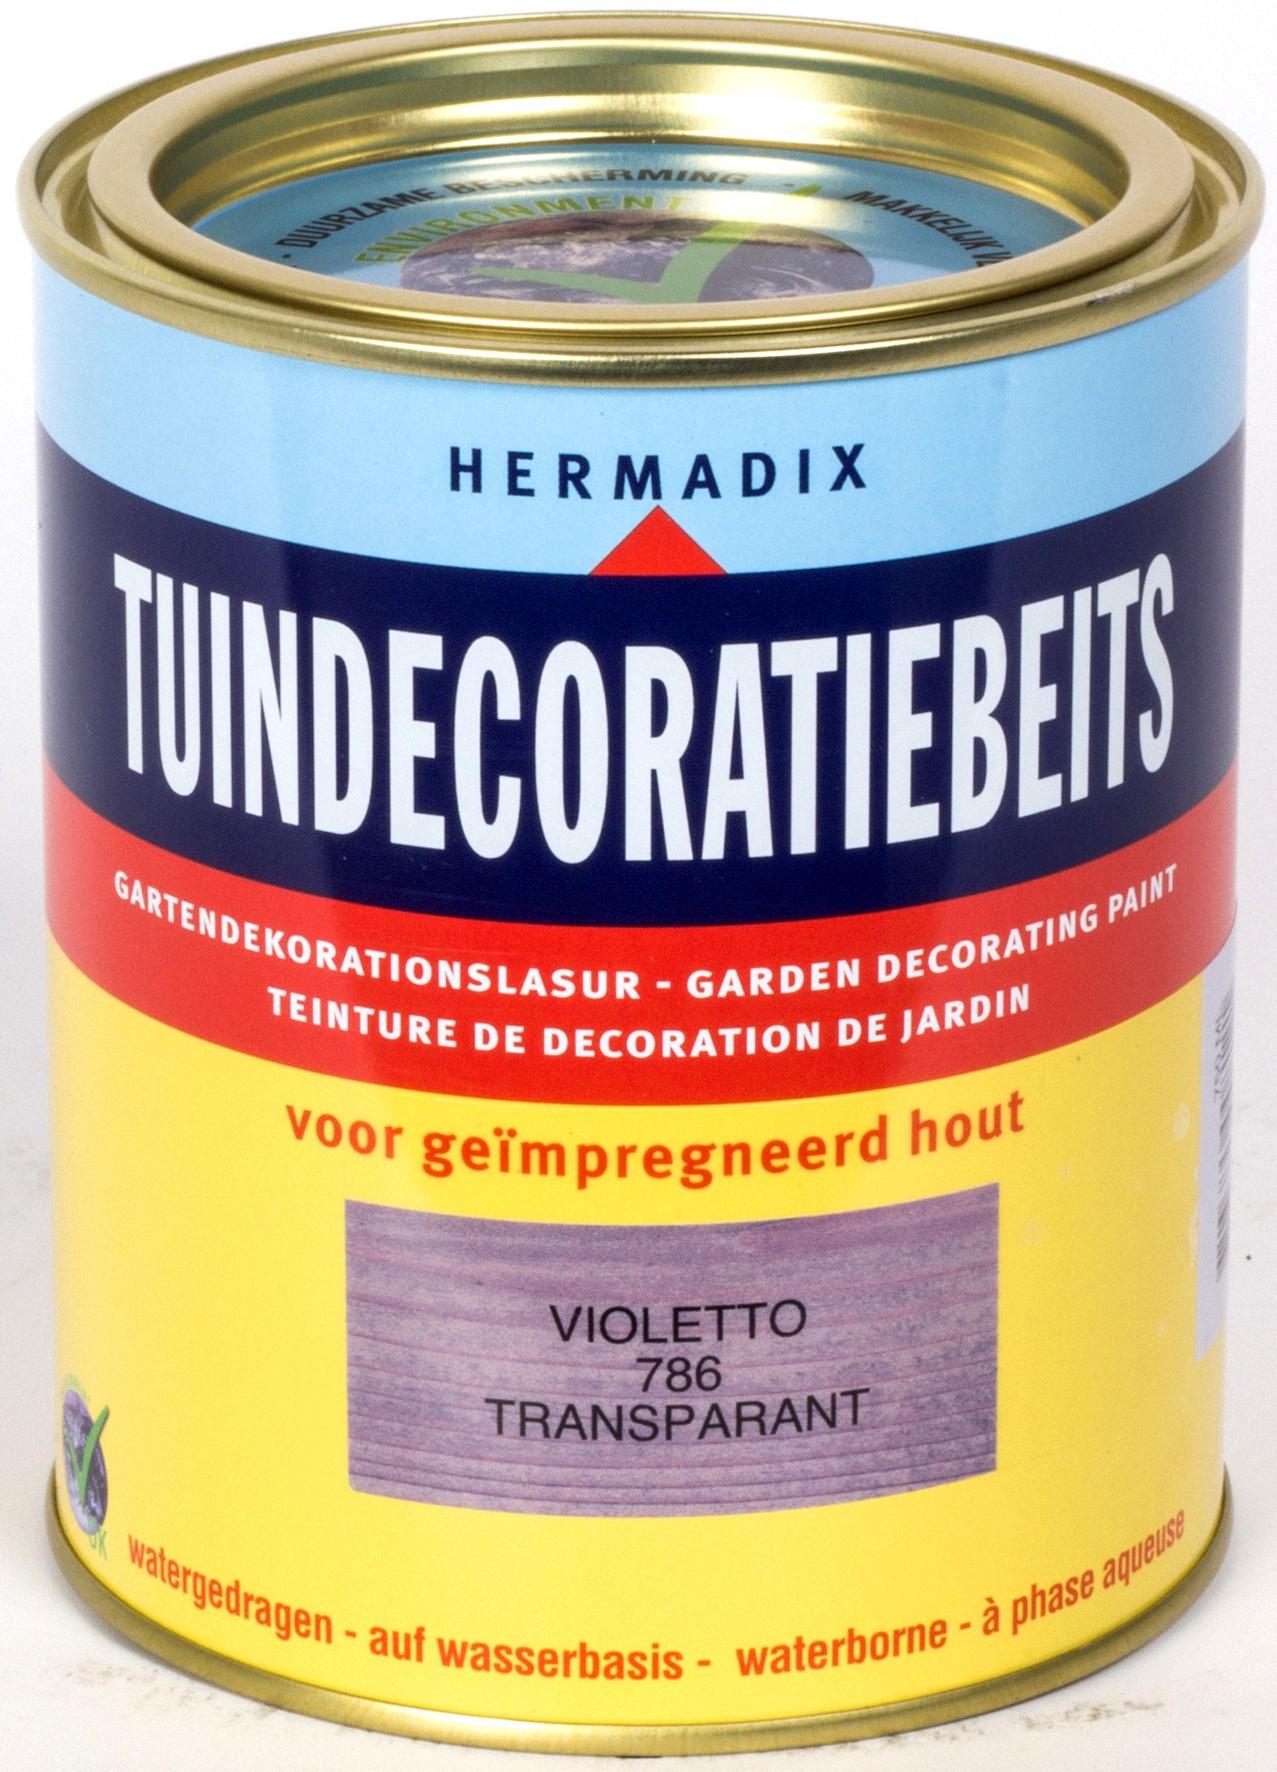 Hermadix beits Hermadix tuindecoratiebeits, transparant, nr. 786 violetto, blik 0,75 liter